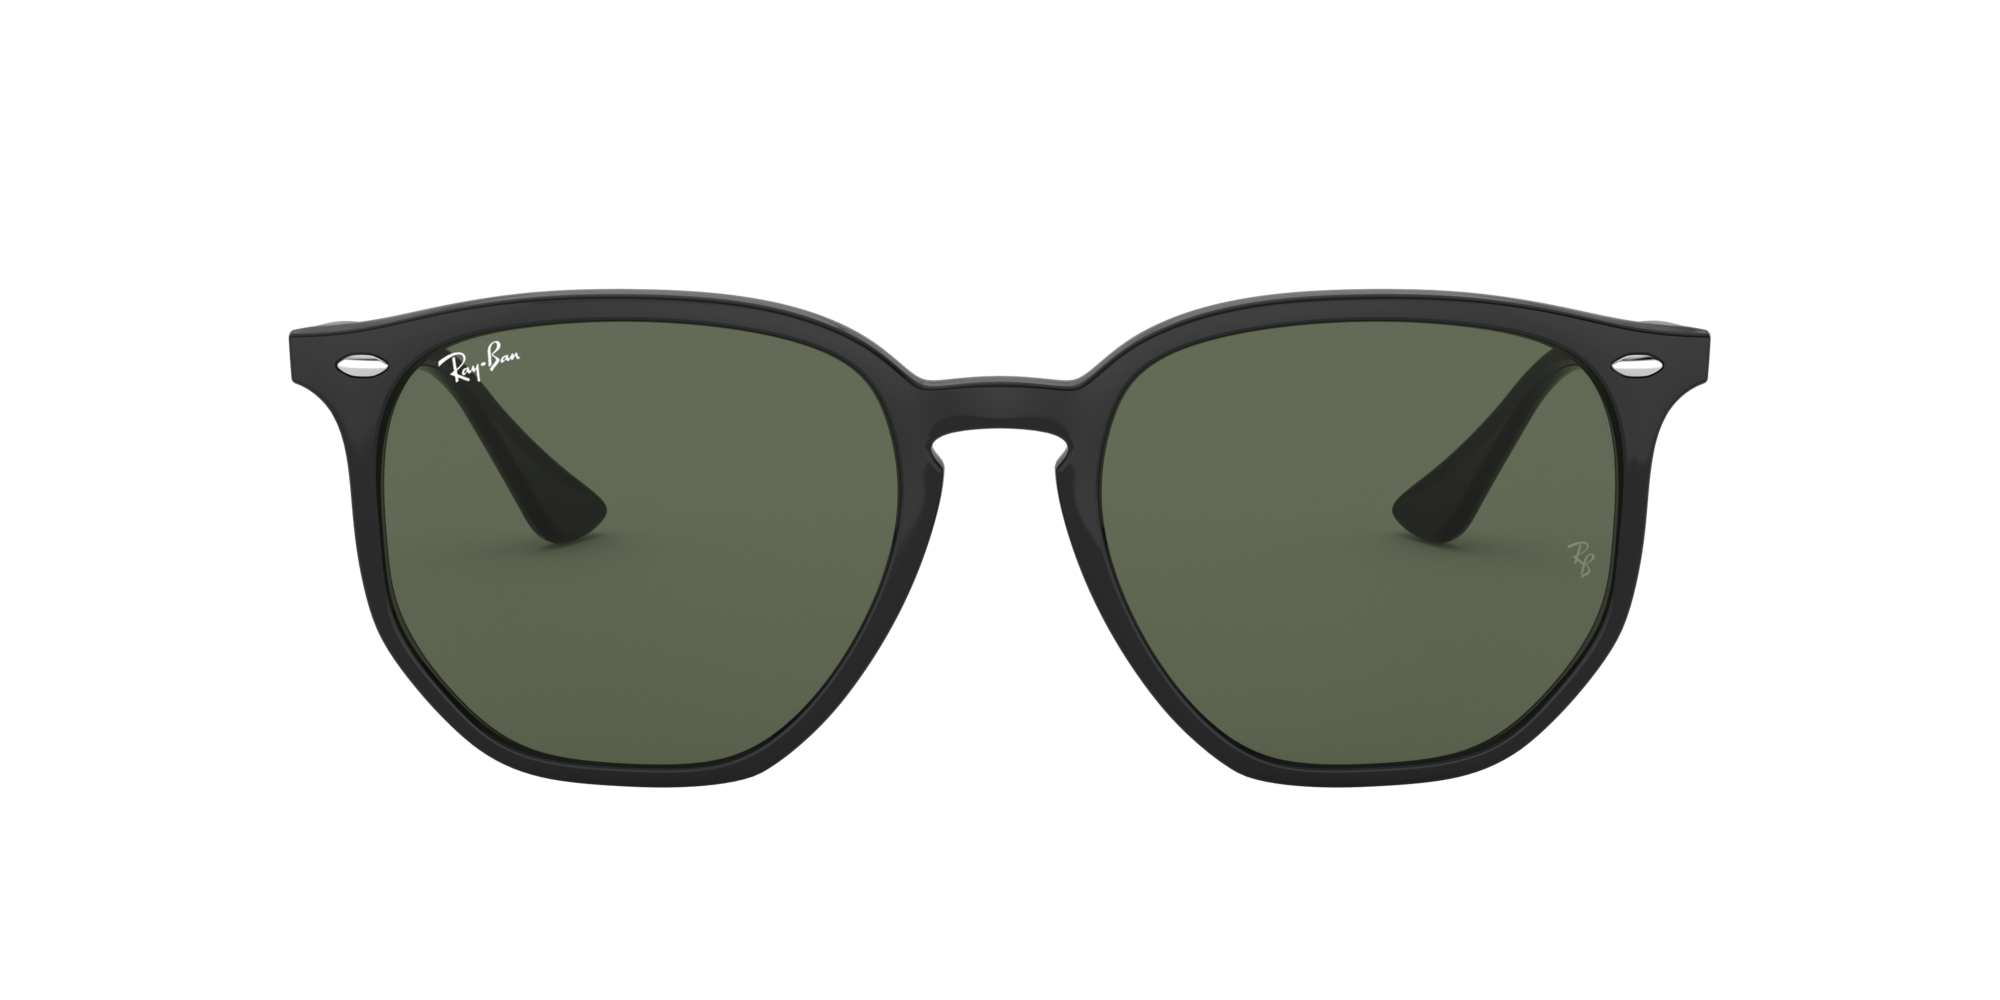 Image for RB4306 54 from LensCrafters | Glasses, Prescription Glasses Online, Eyewear